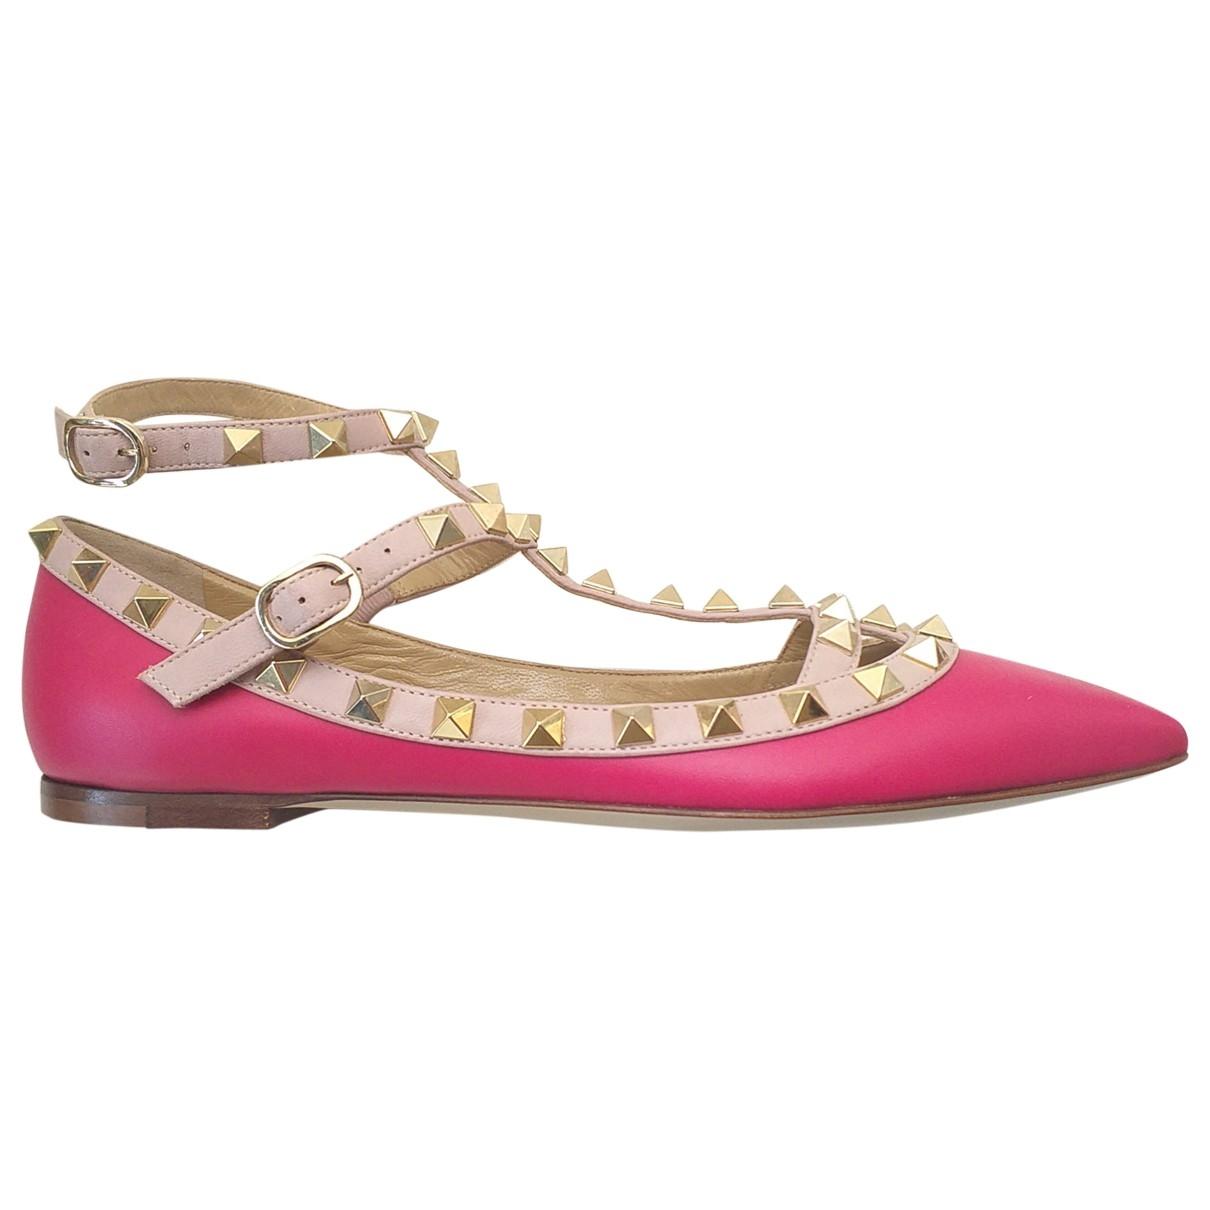 Valentino Garavani - Ballerines Rockstud pour femme en cuir - rose